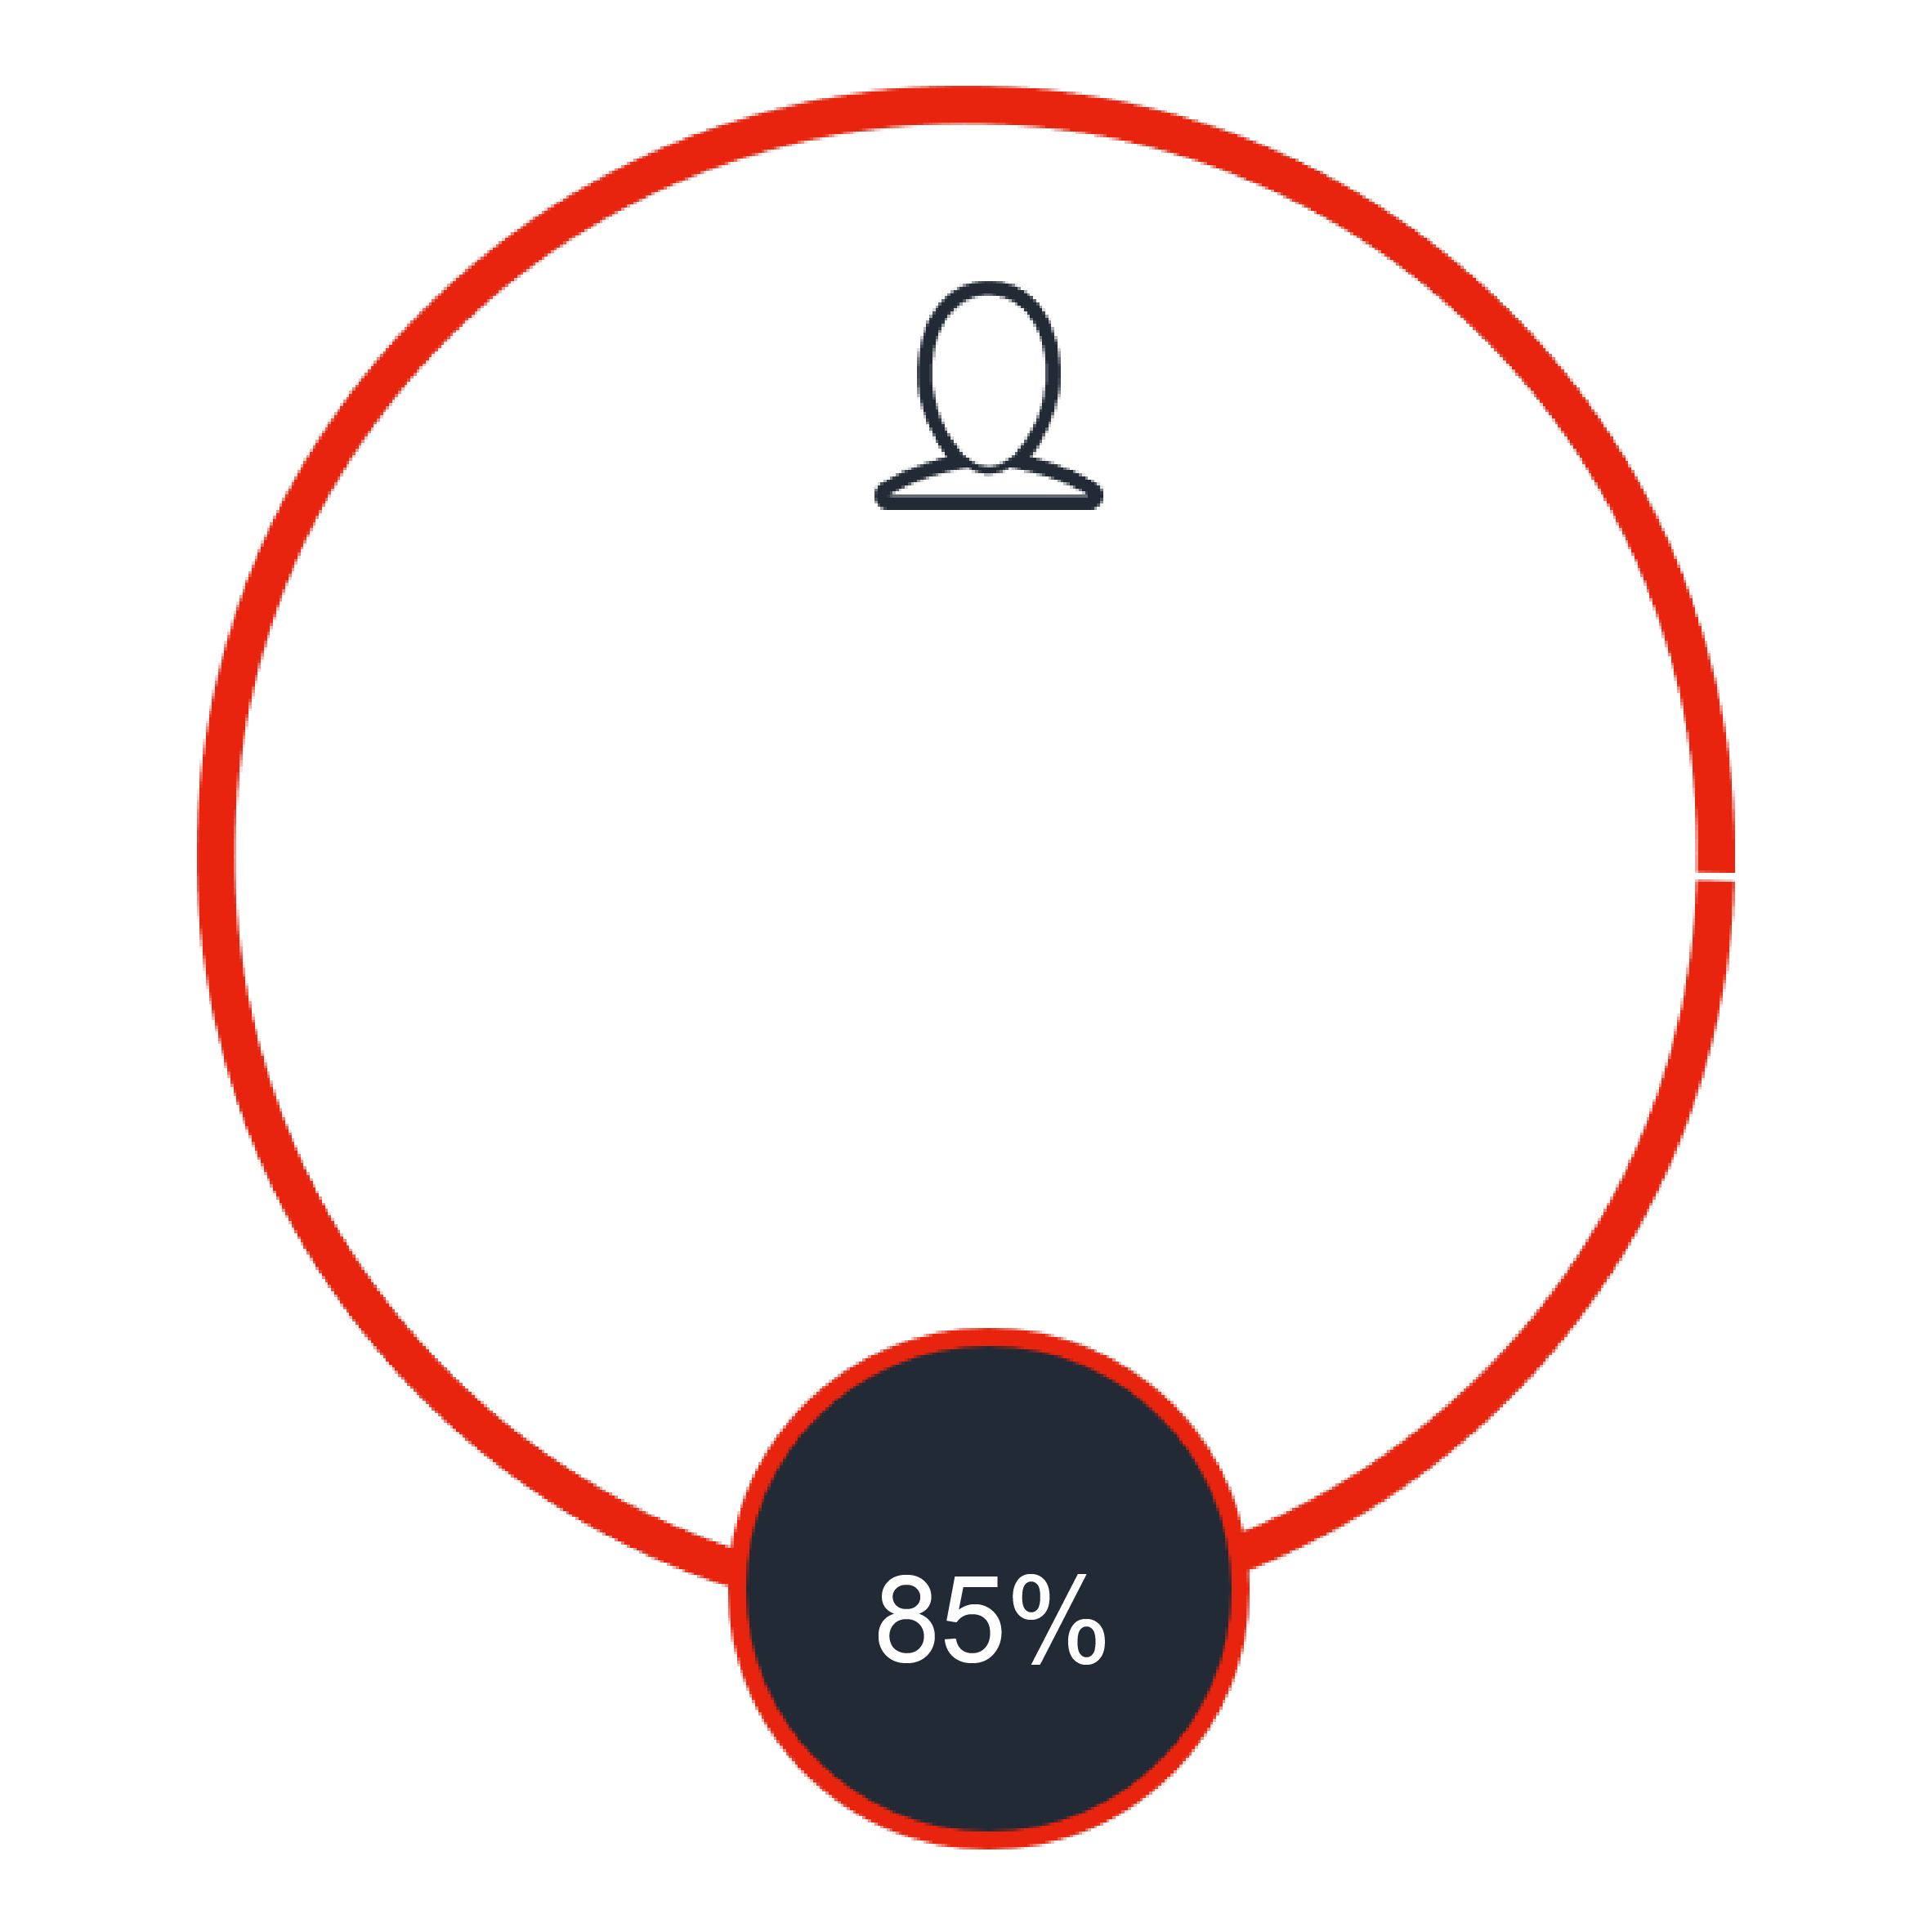 85% graph